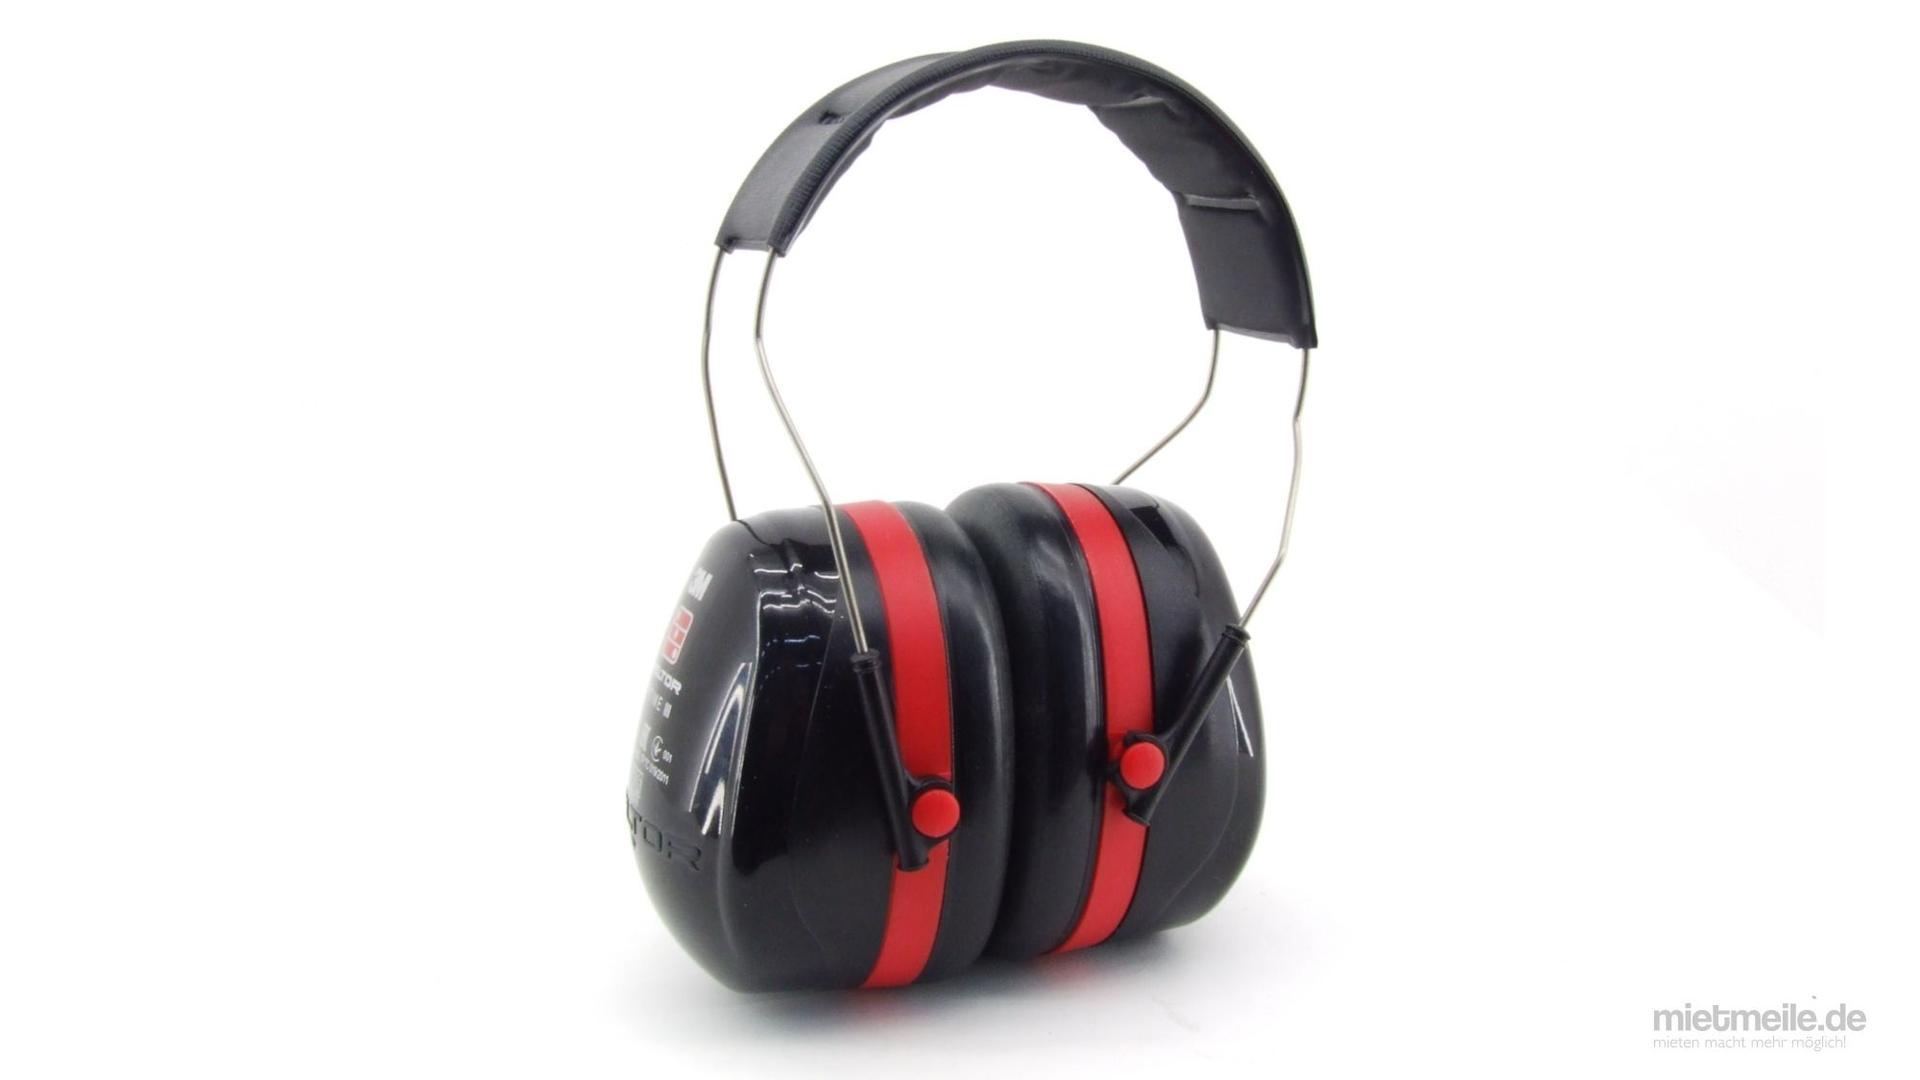 Arbeitsschutzausrüstung mieten & vermieten - Kapselgehörschutz Ohrenschützer Größenverstellbar in Schkeuditz